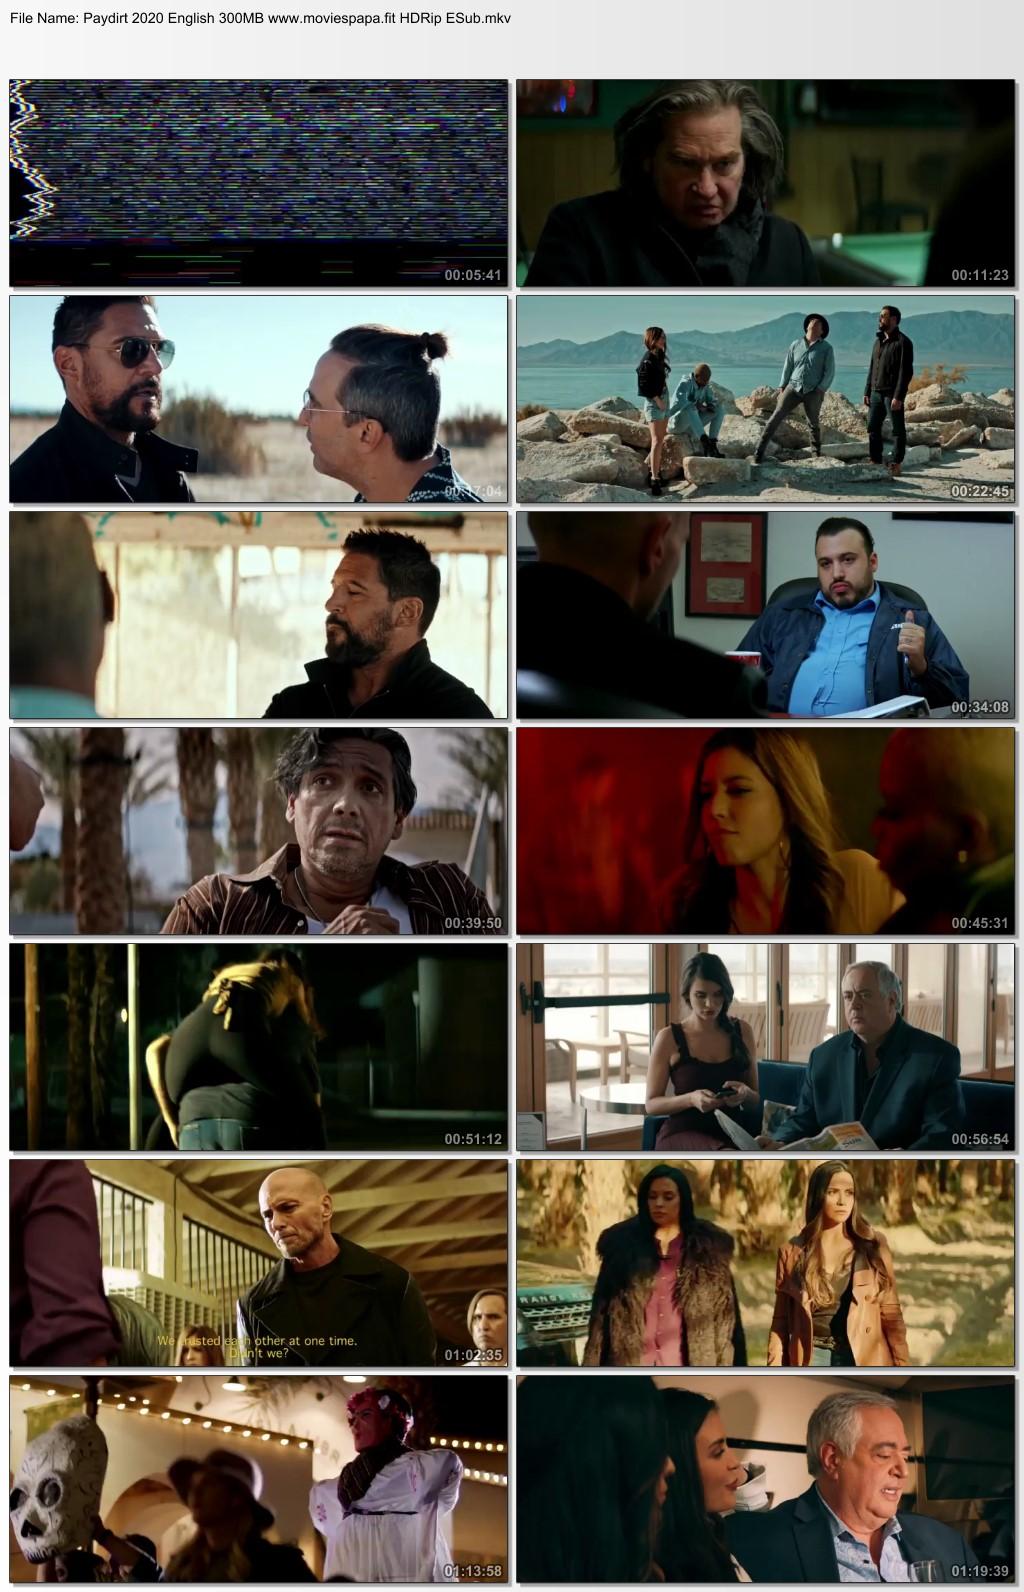 Paydirt 2020 English Movie 310MB HDRip ESub Download